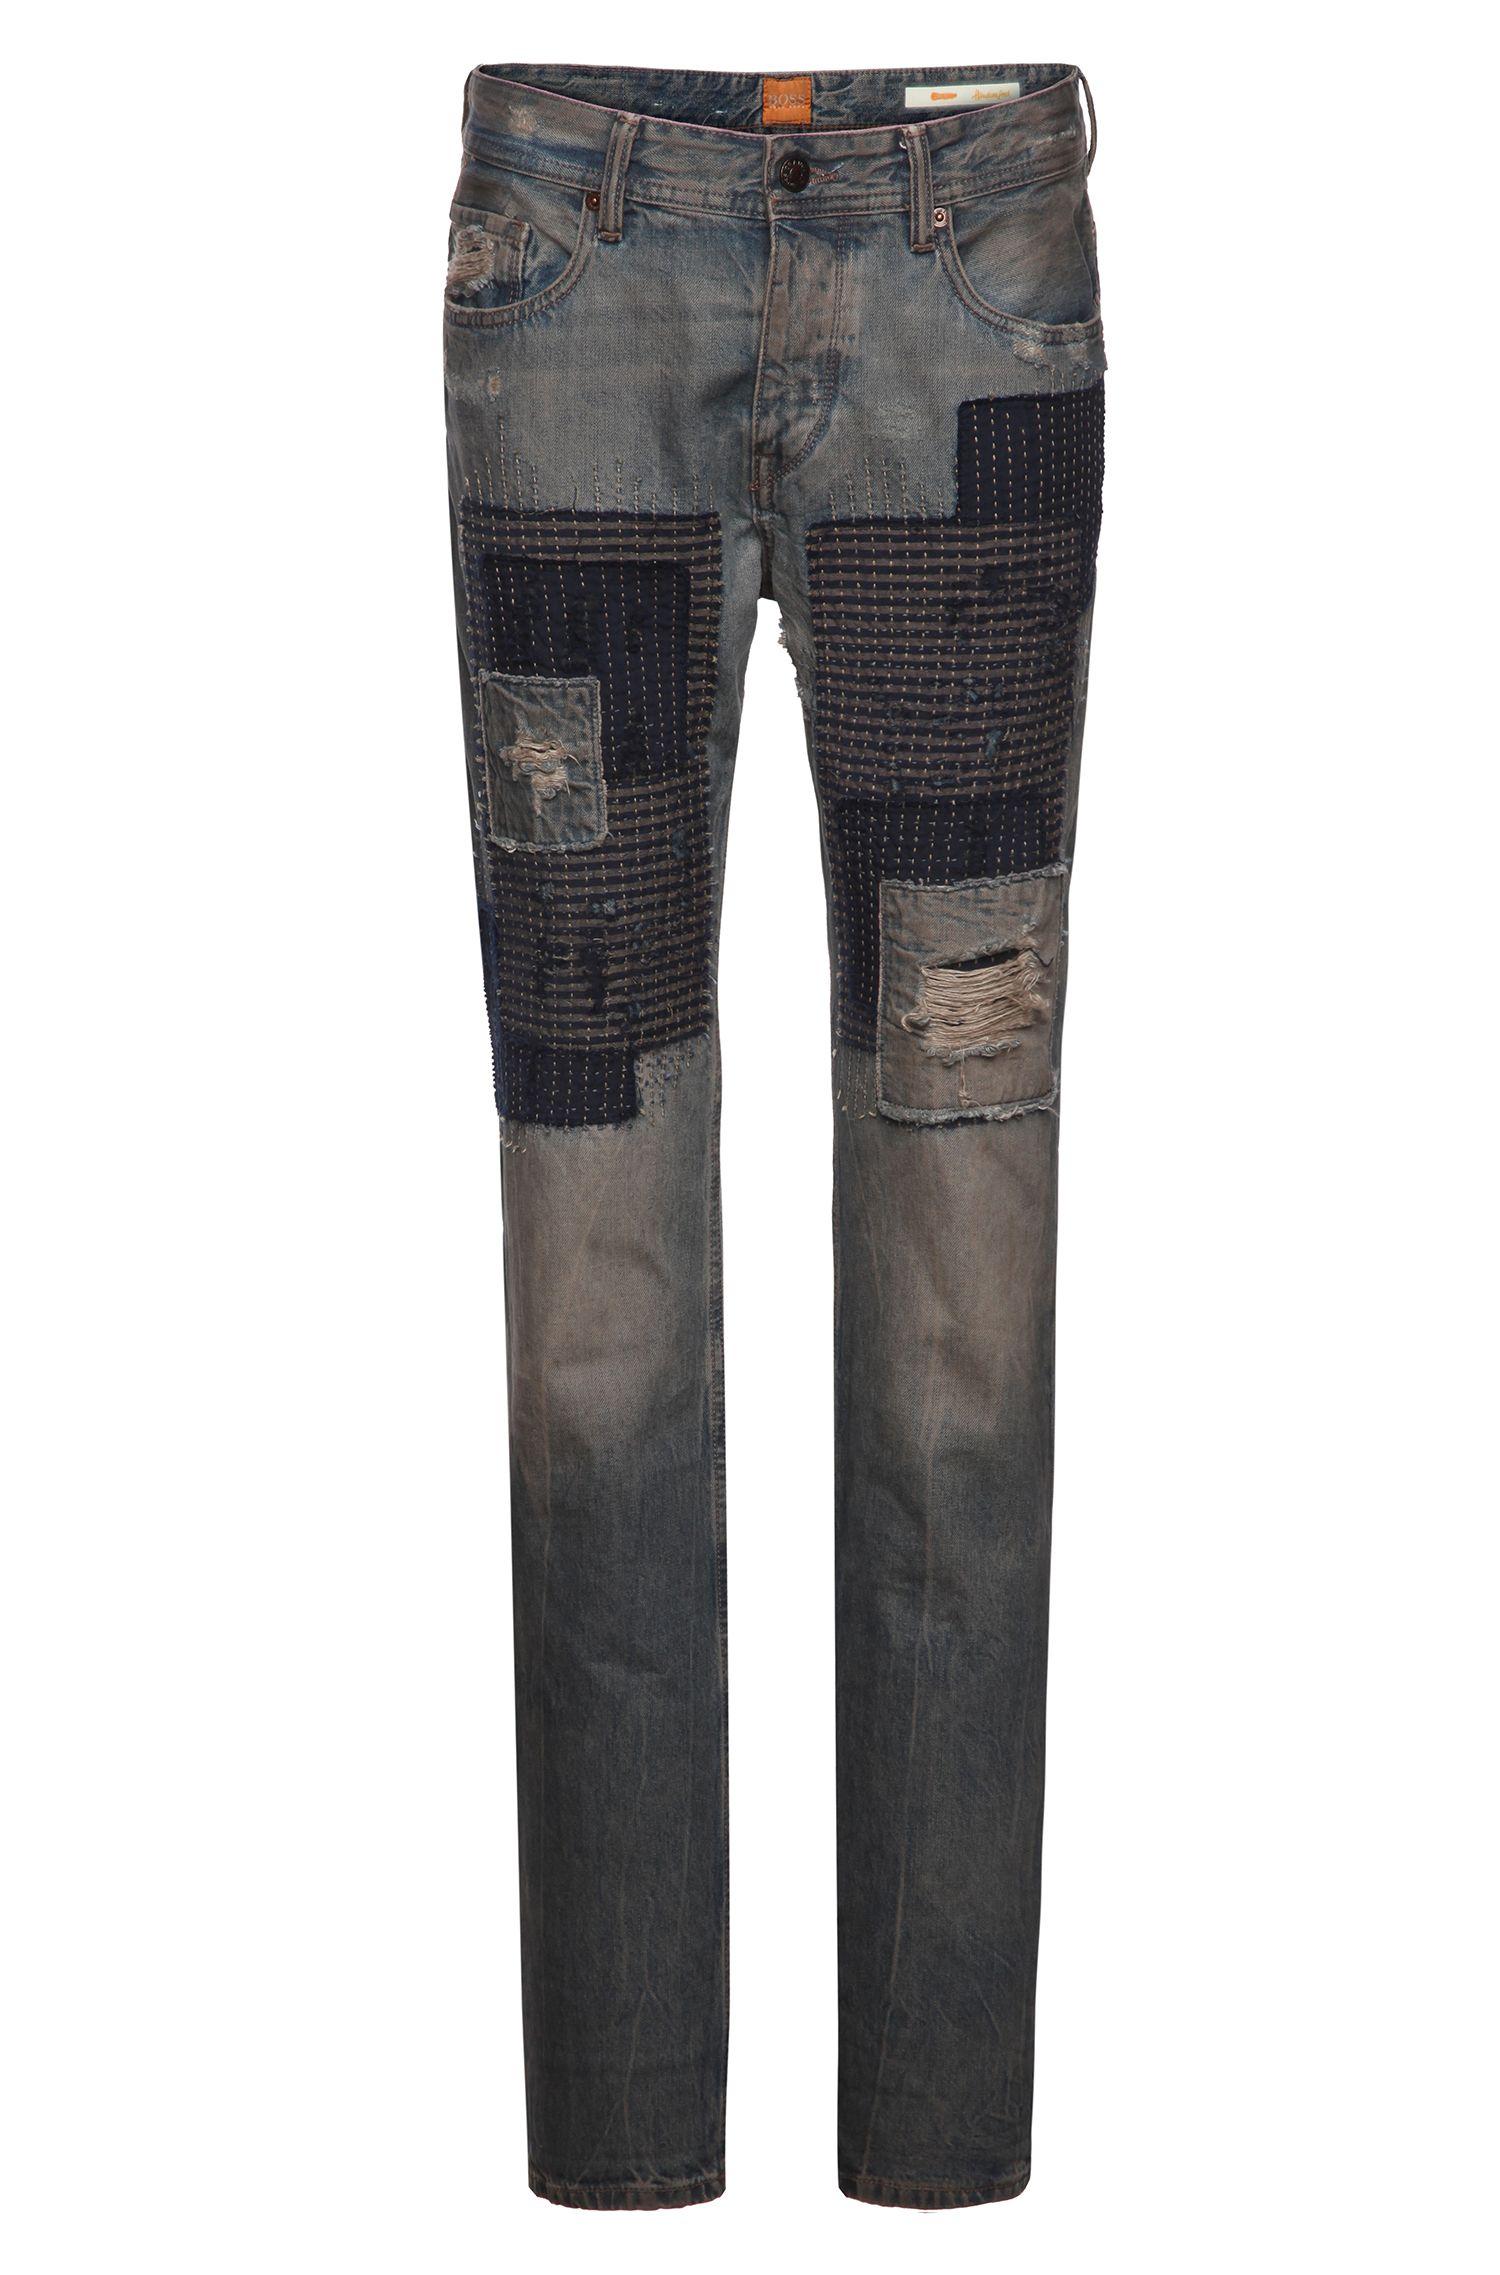 'Orange 90' | Tapered Fit, 11.5 oz Cotton Jeans